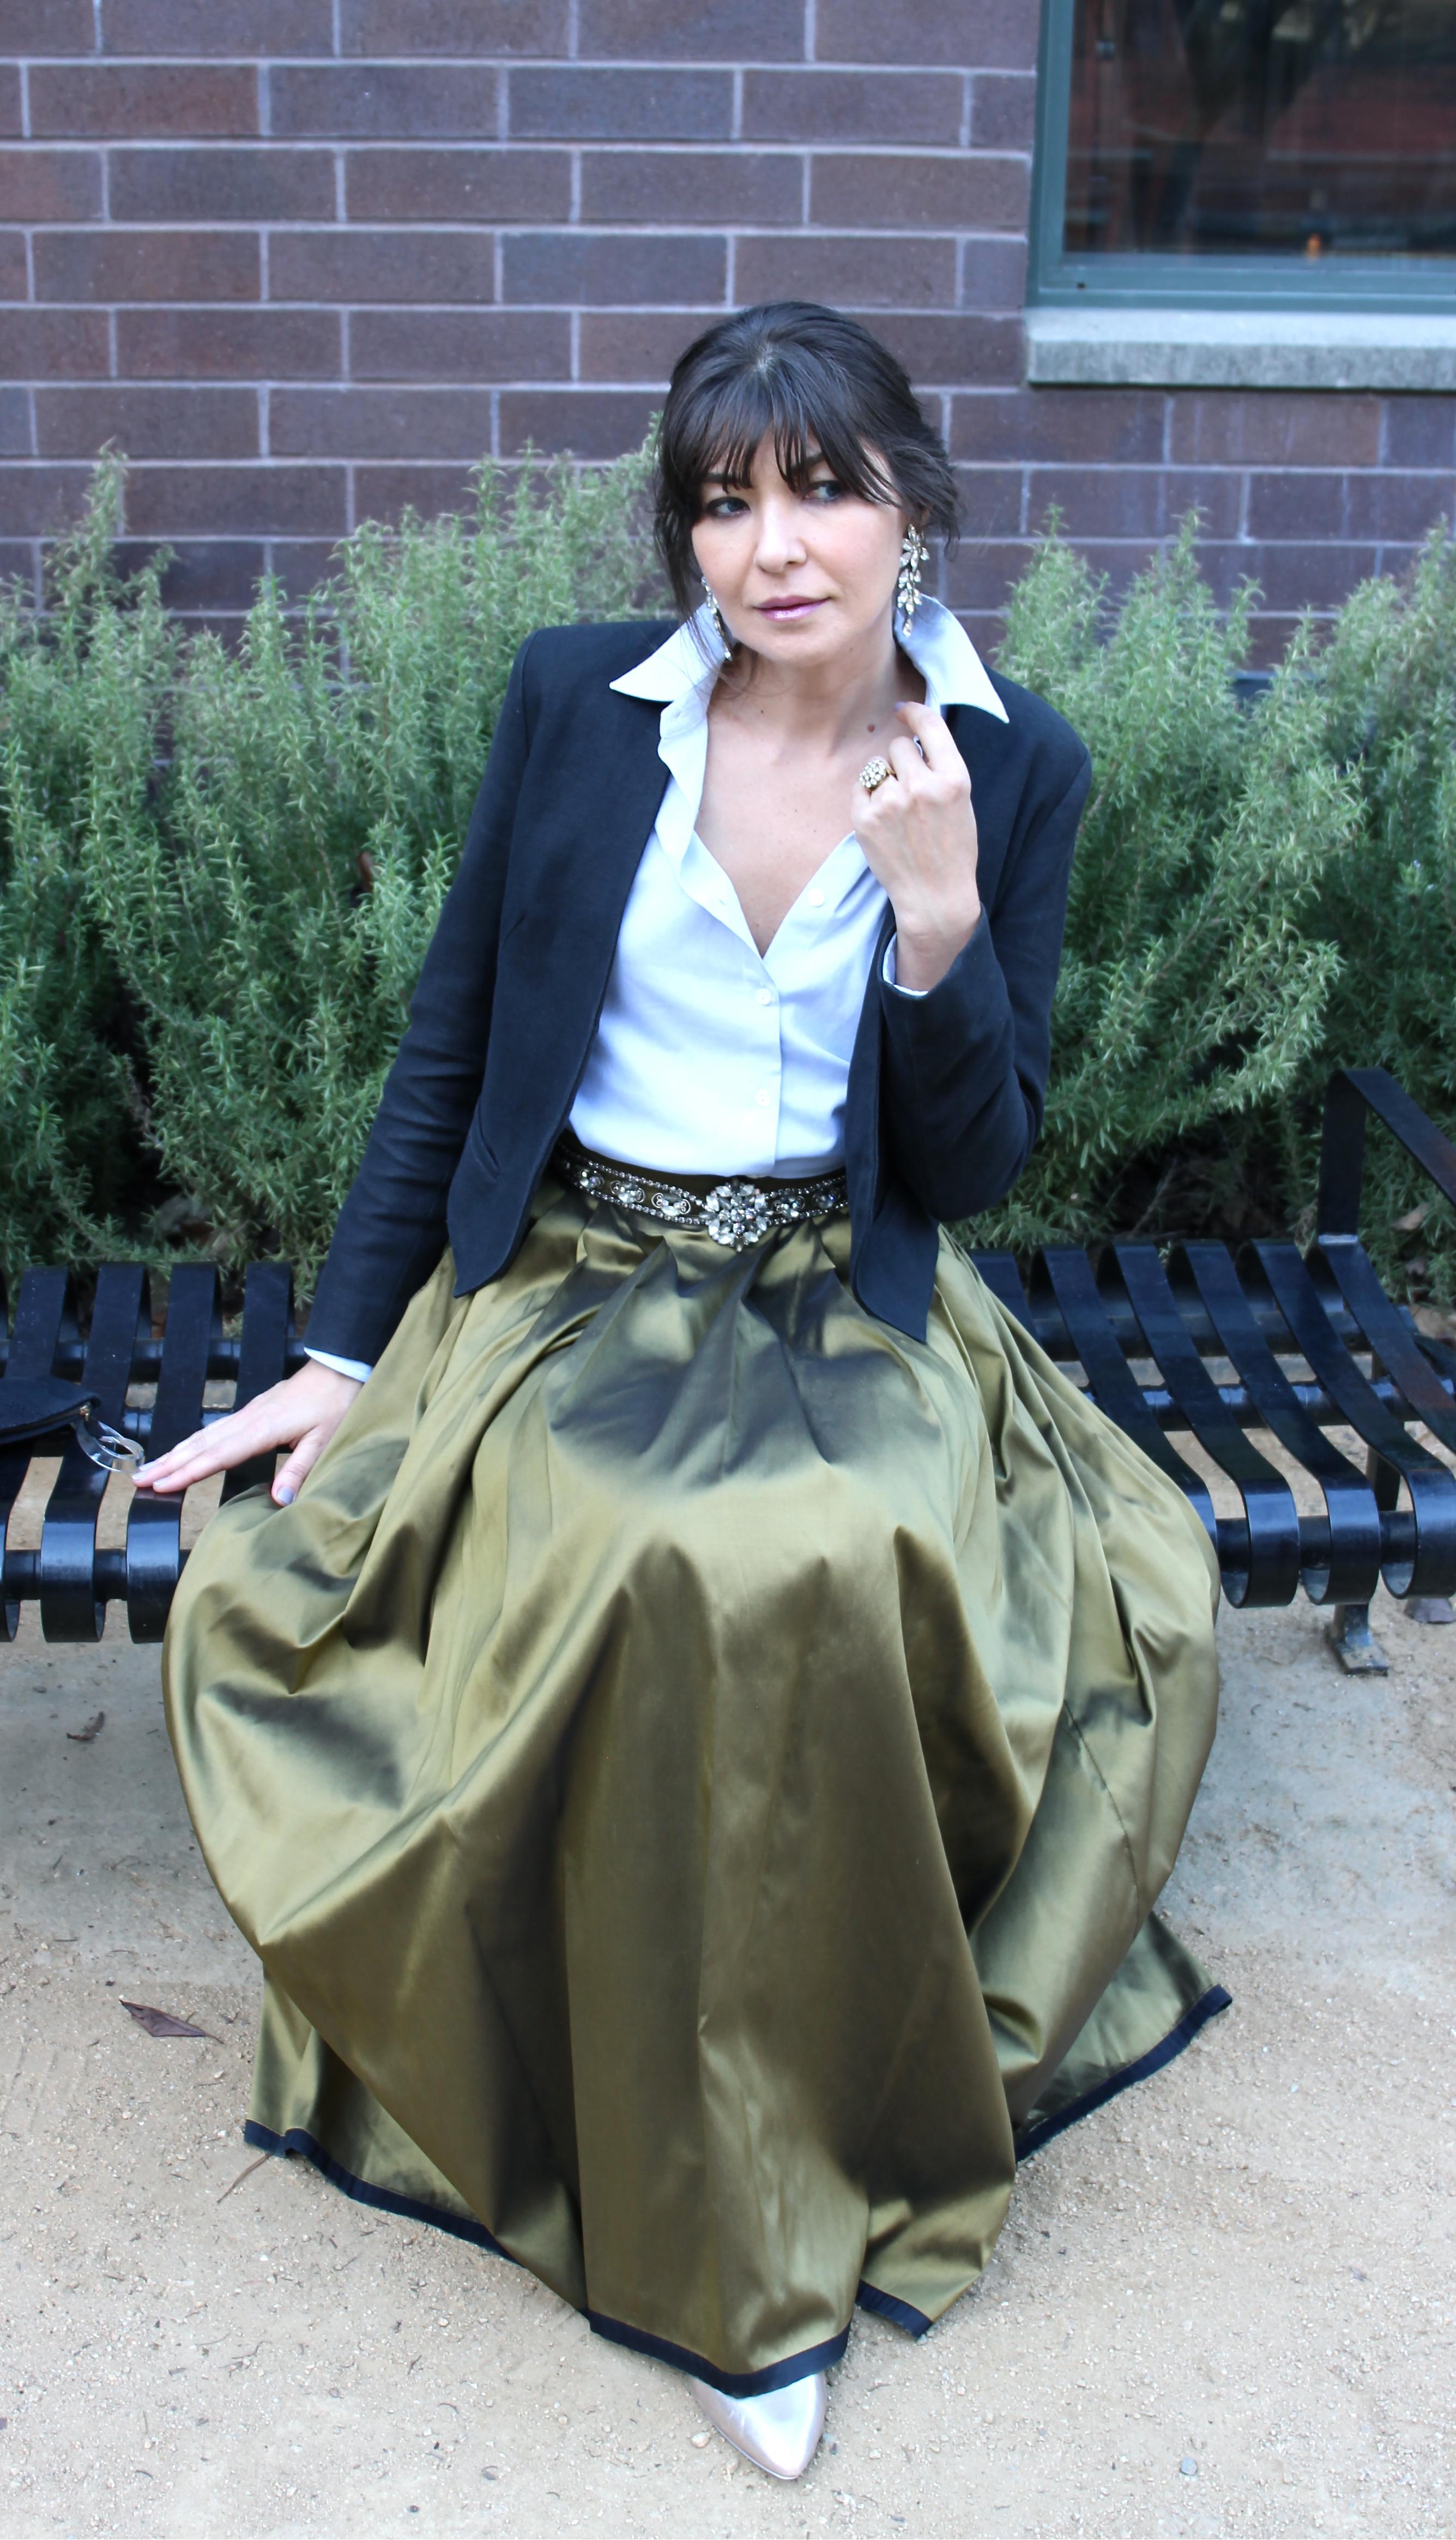 Moda Vive maxi skirt and Sasha Maks Vintage Kenneth Lane belt.